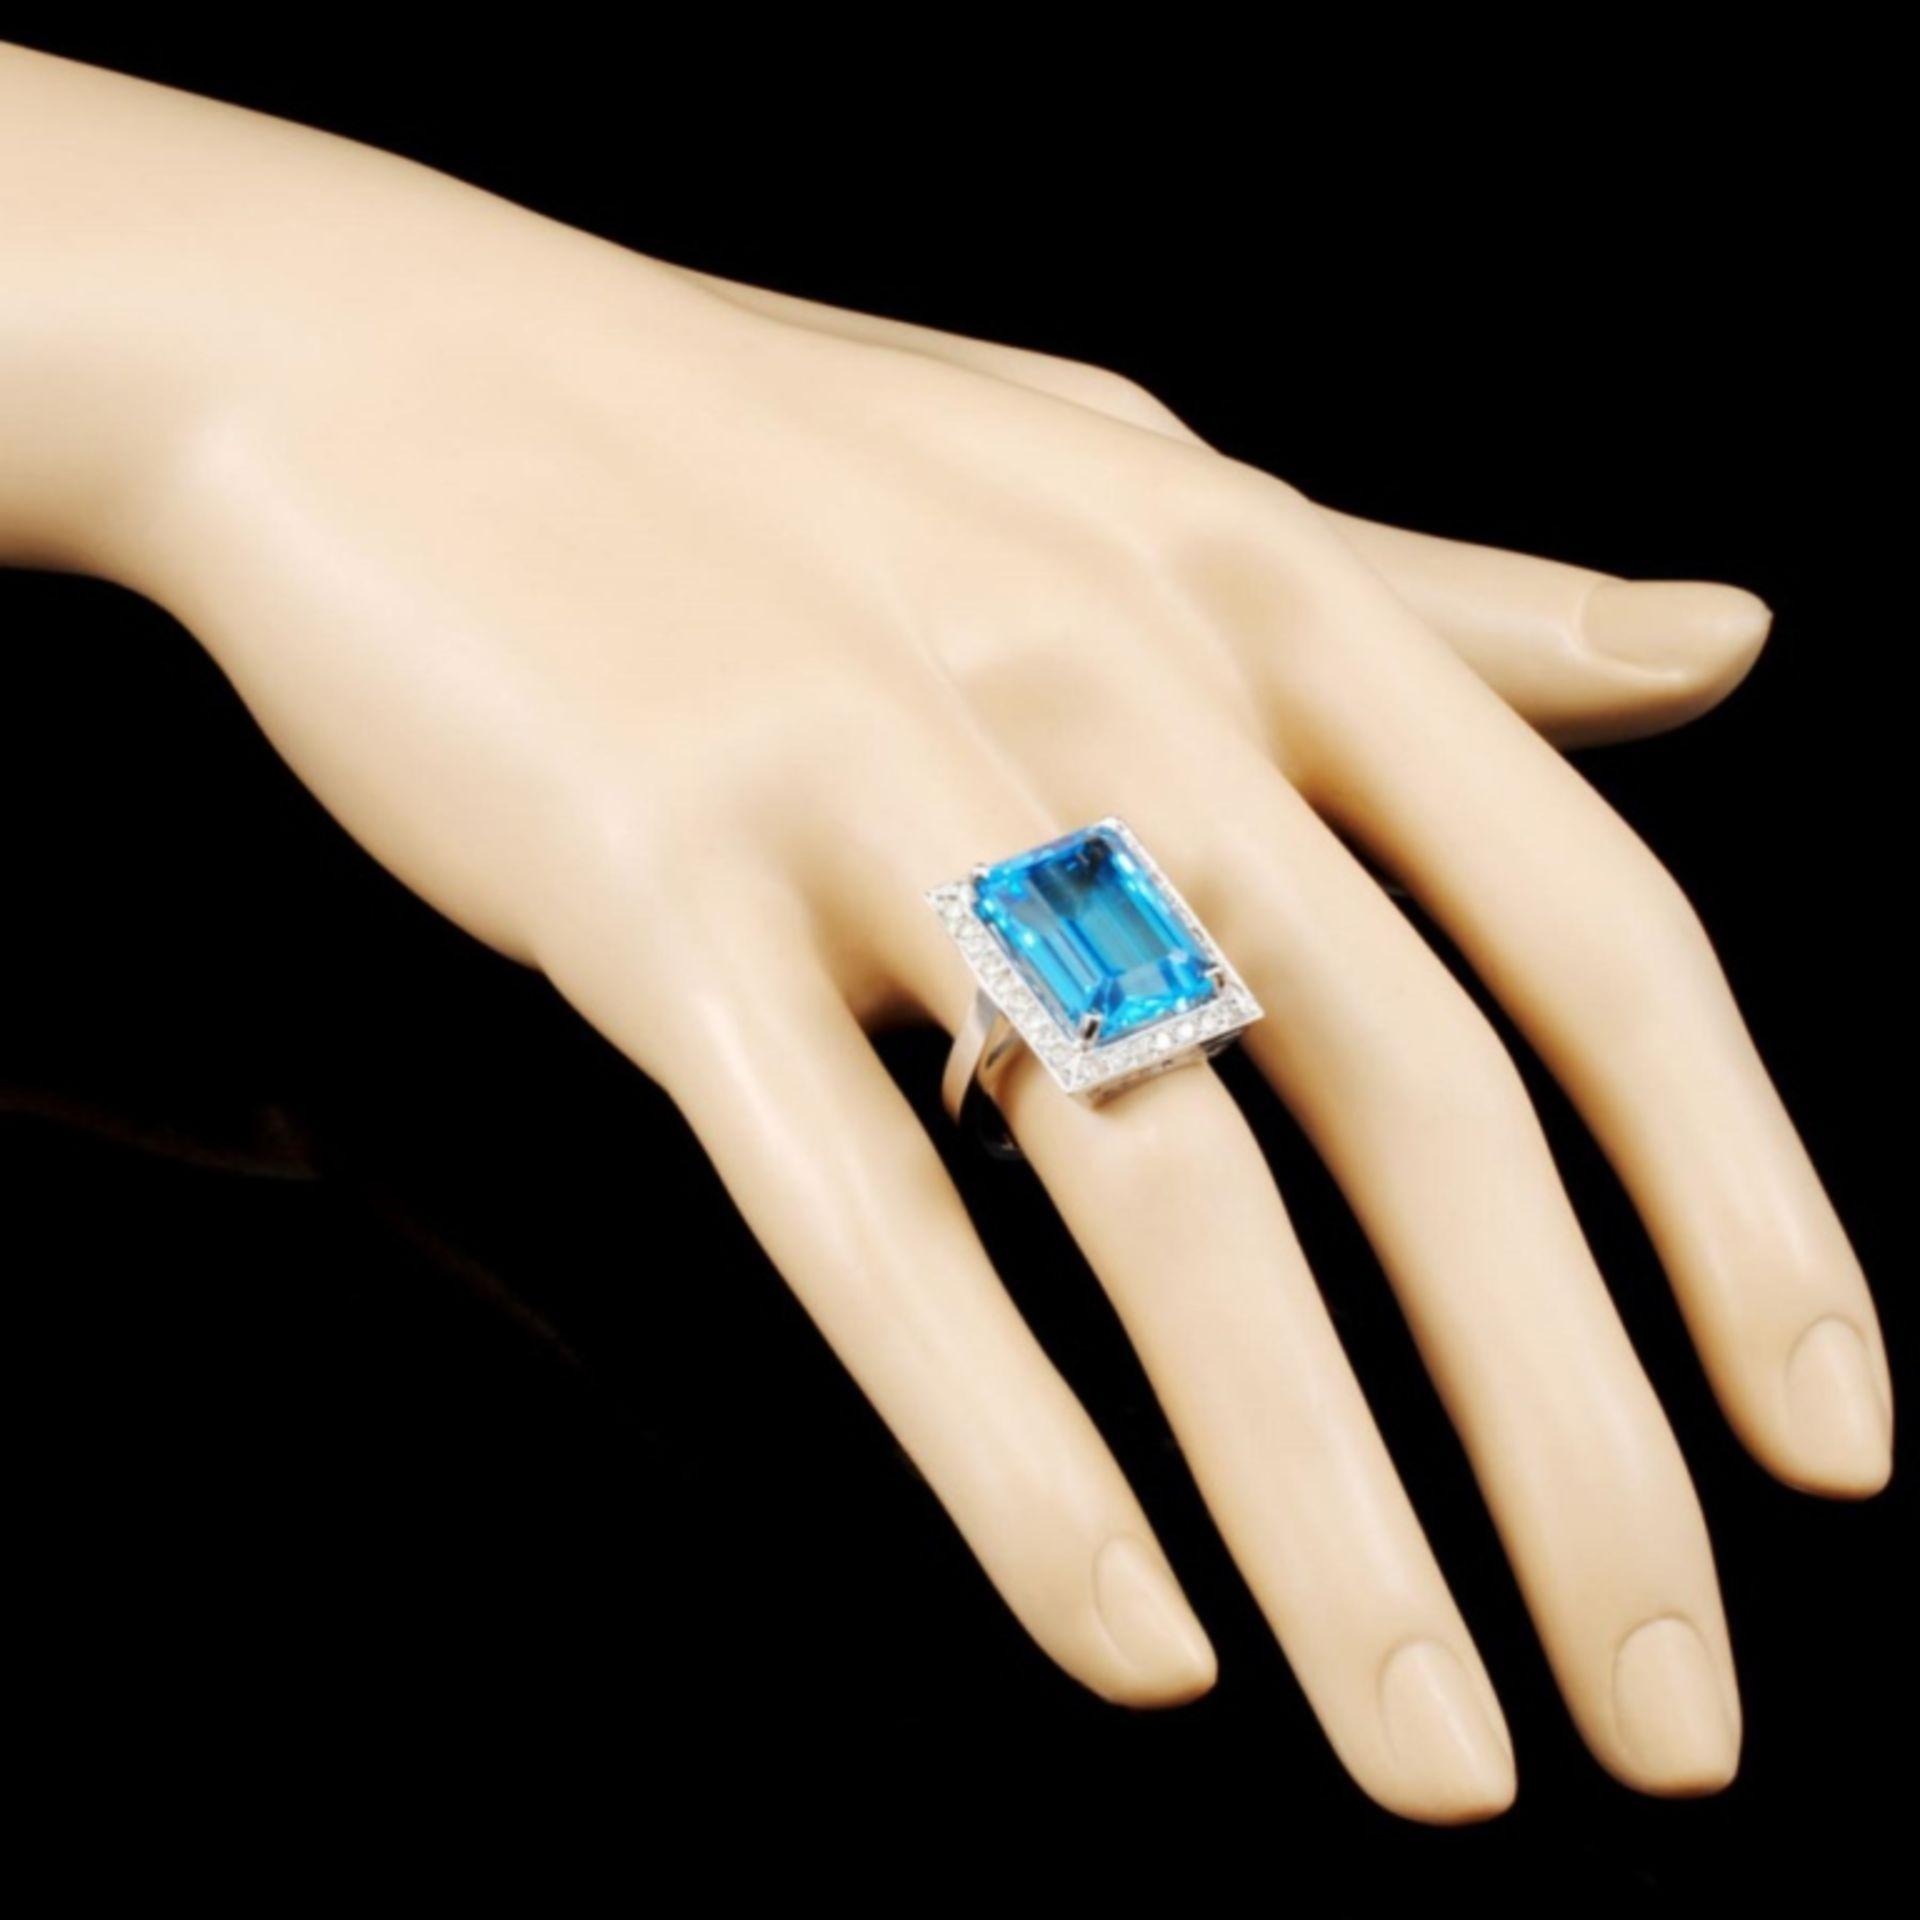 18K Gold 13.96ct Topaz & 0.52ctw Diamond Ring - Image 3 of 4